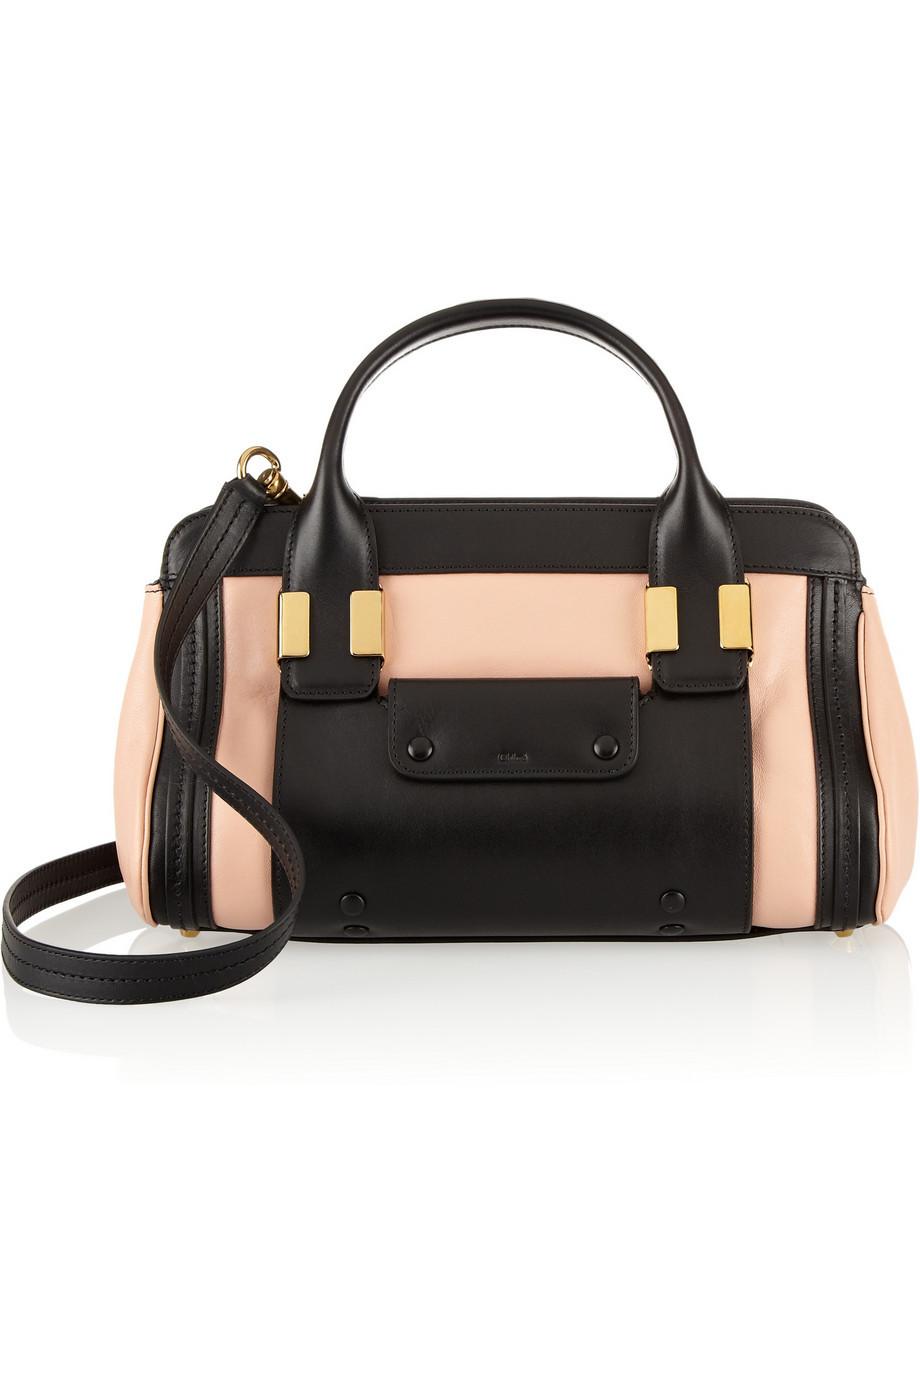 Lady Fahion Handbag For European Ladies